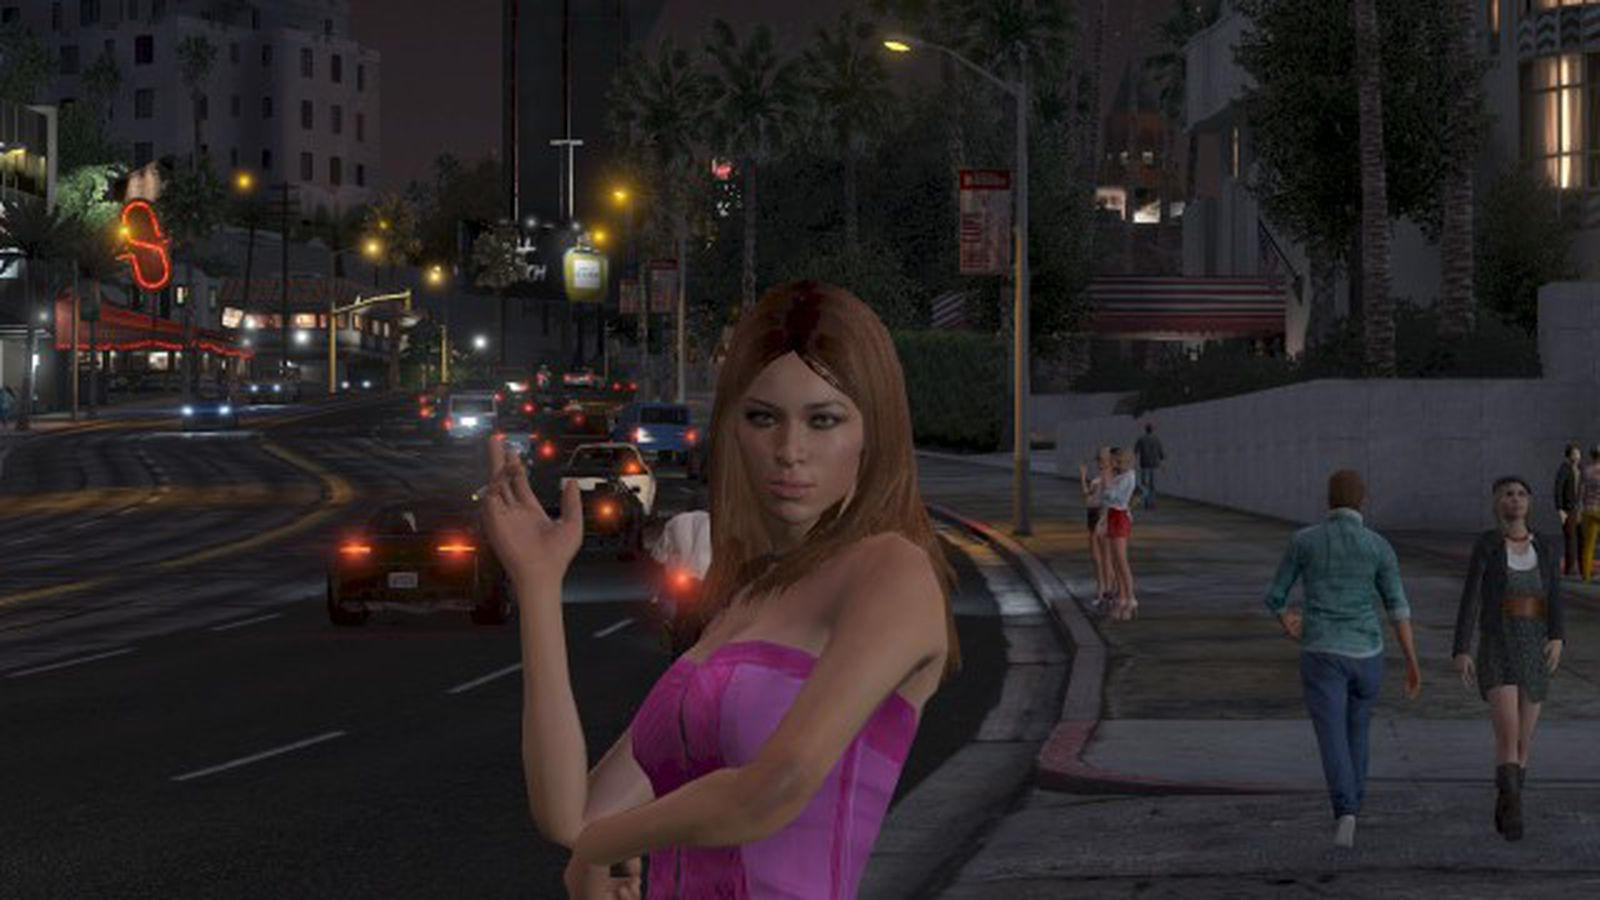 Grand Theft Auto 5s misogyny is a problem its creators